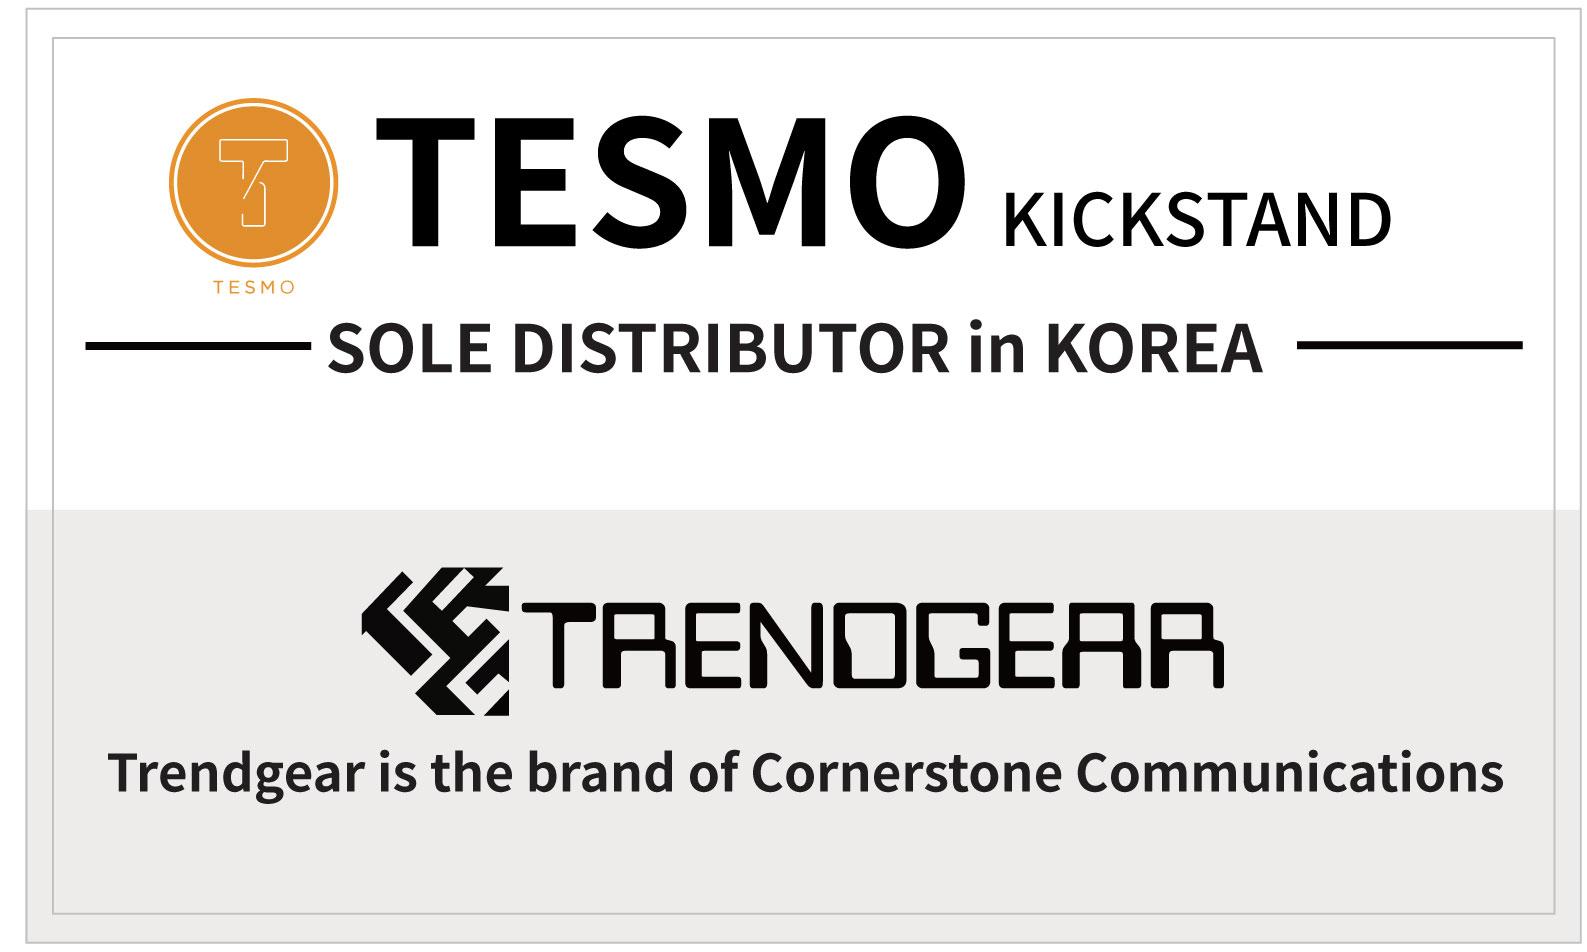 tesmo 상품상세설명